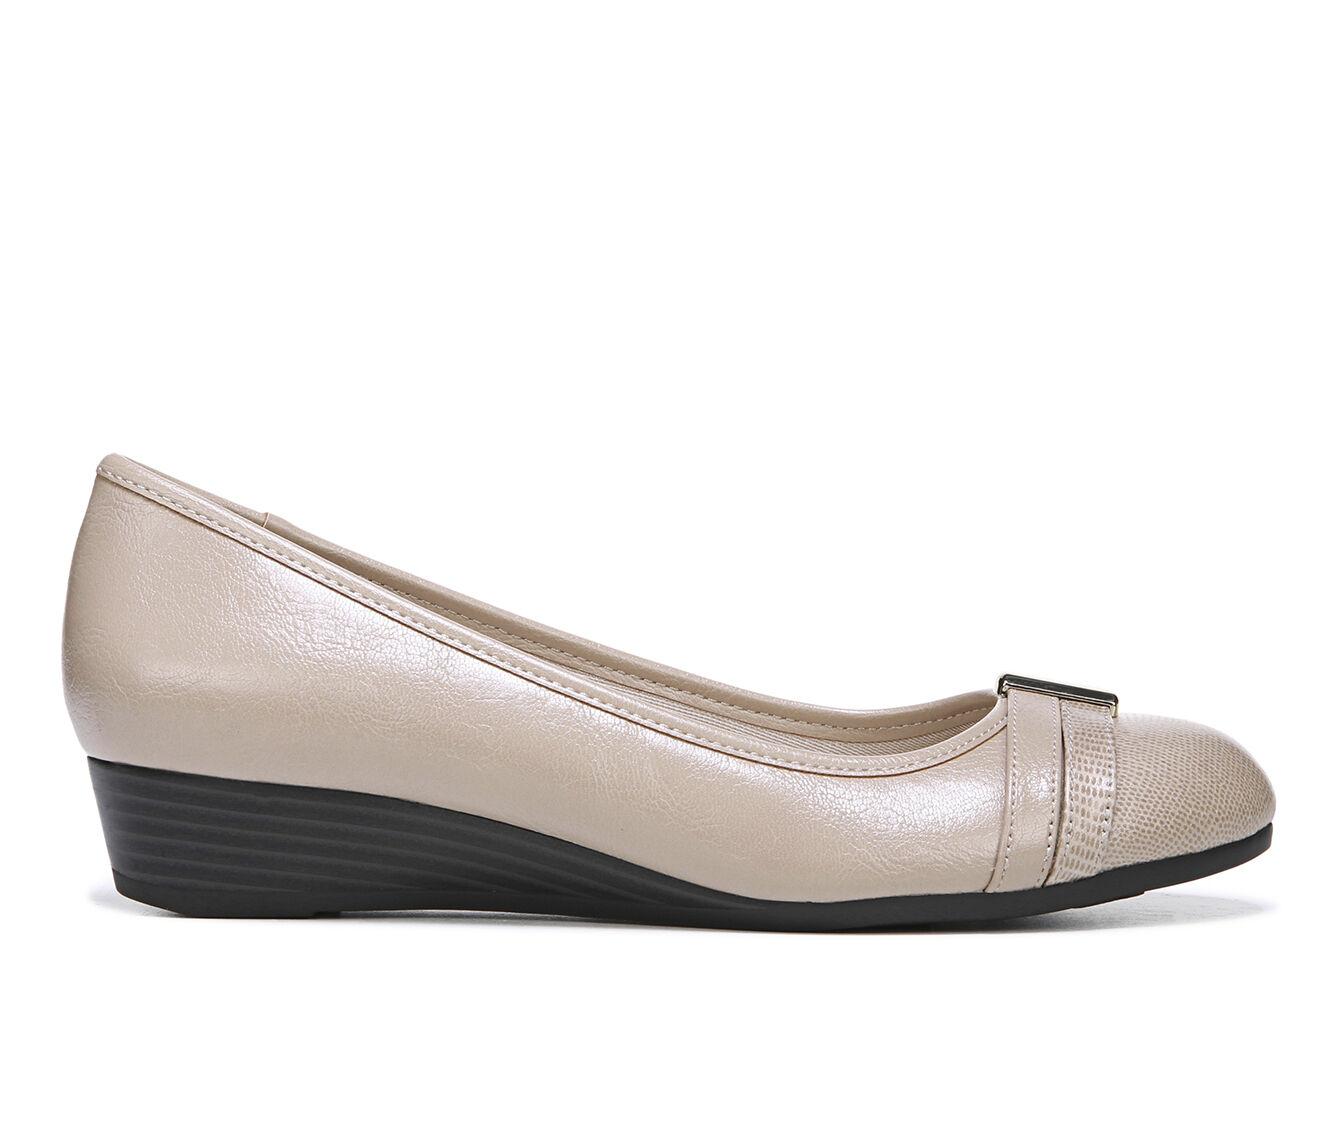 For Sale Women's LifeStride Frances Shoes Taupe